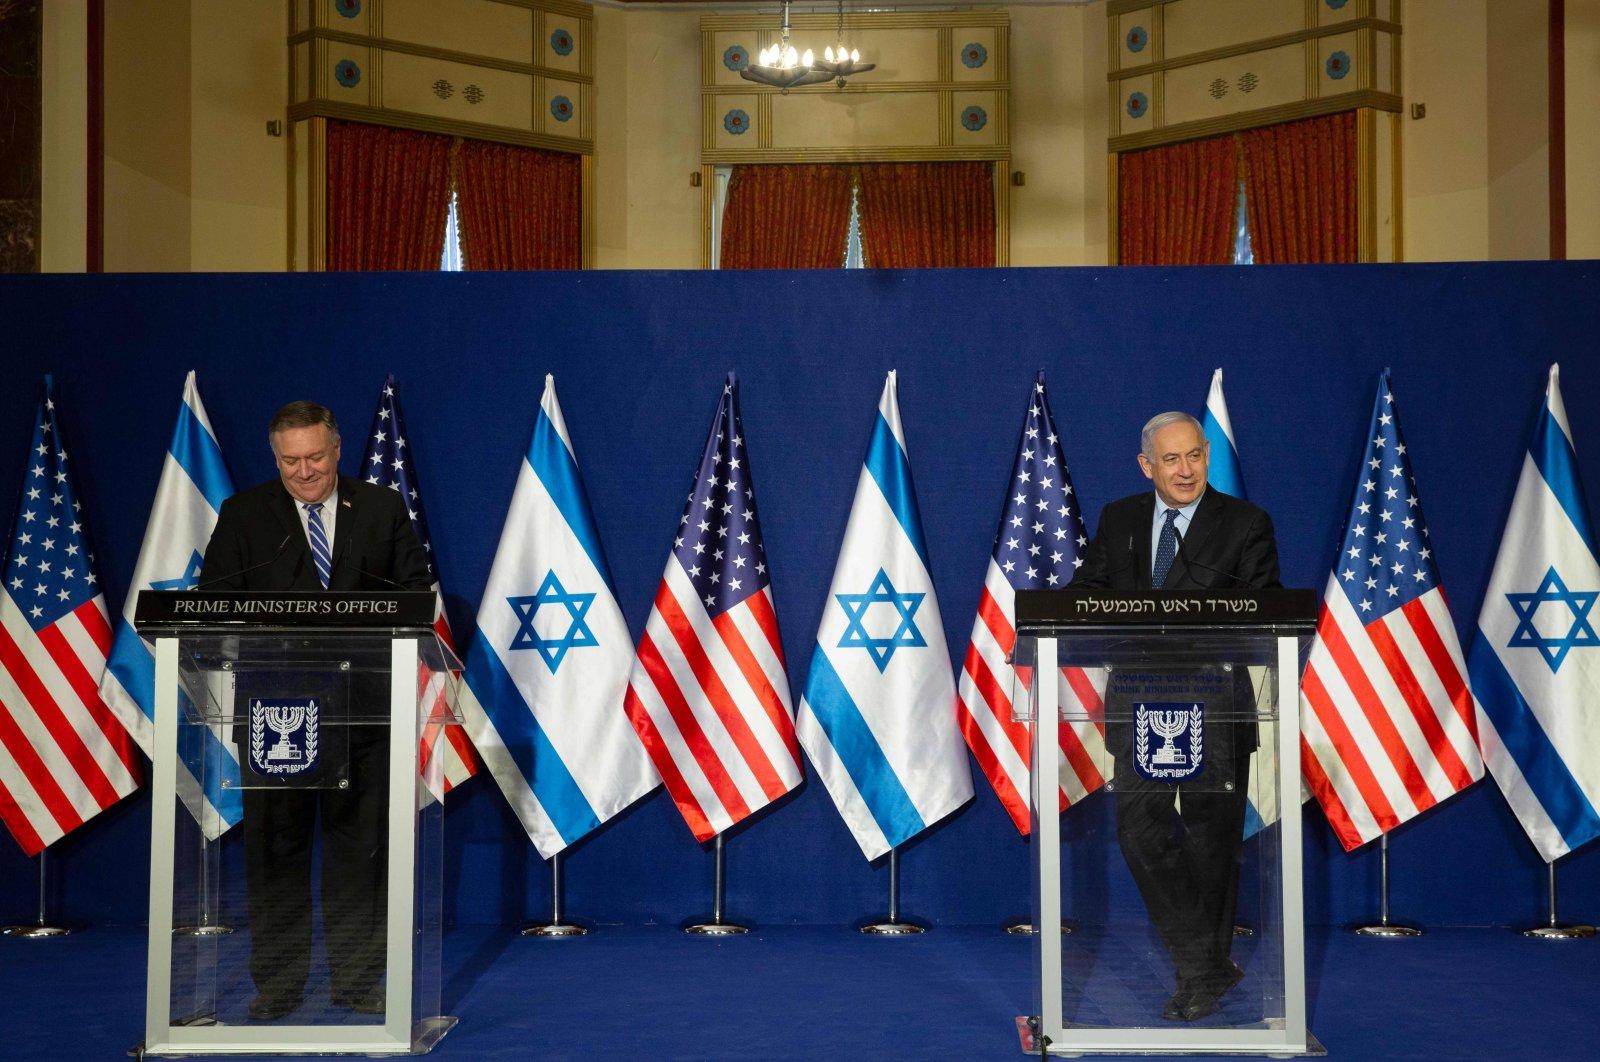 U.S. Secretary of State Mike Pompeo and Israeli Prime Minister Benjamin Netanyahu make a joint statement in Jerusalem, Nov. 19, 2020. (AFP Photo)